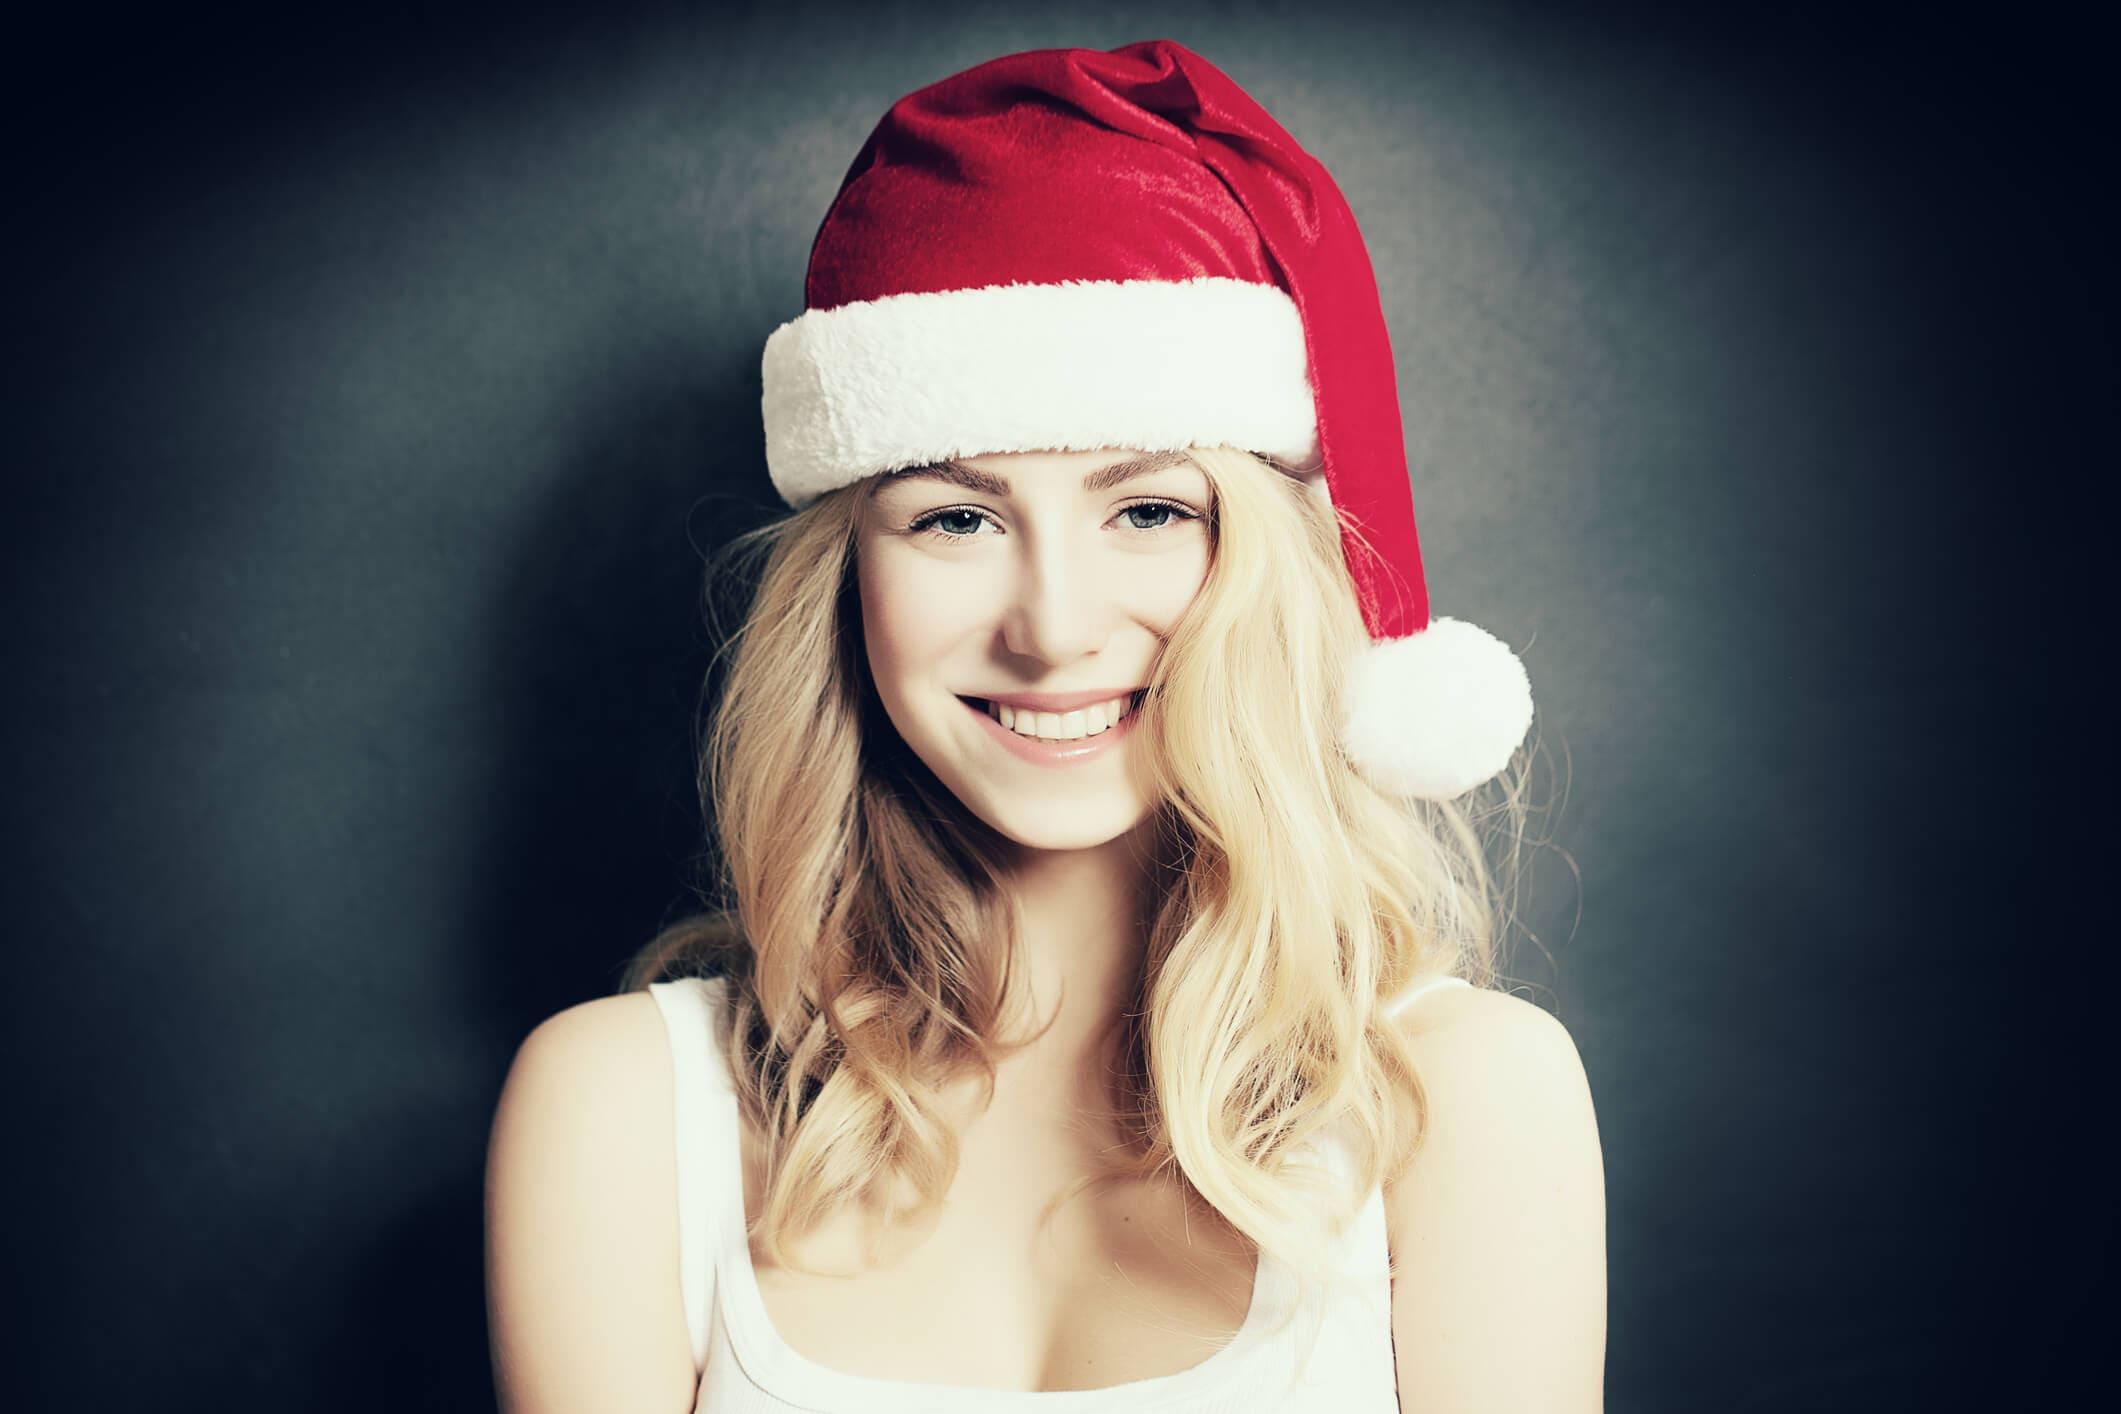 ondas románticas peinados para navidad